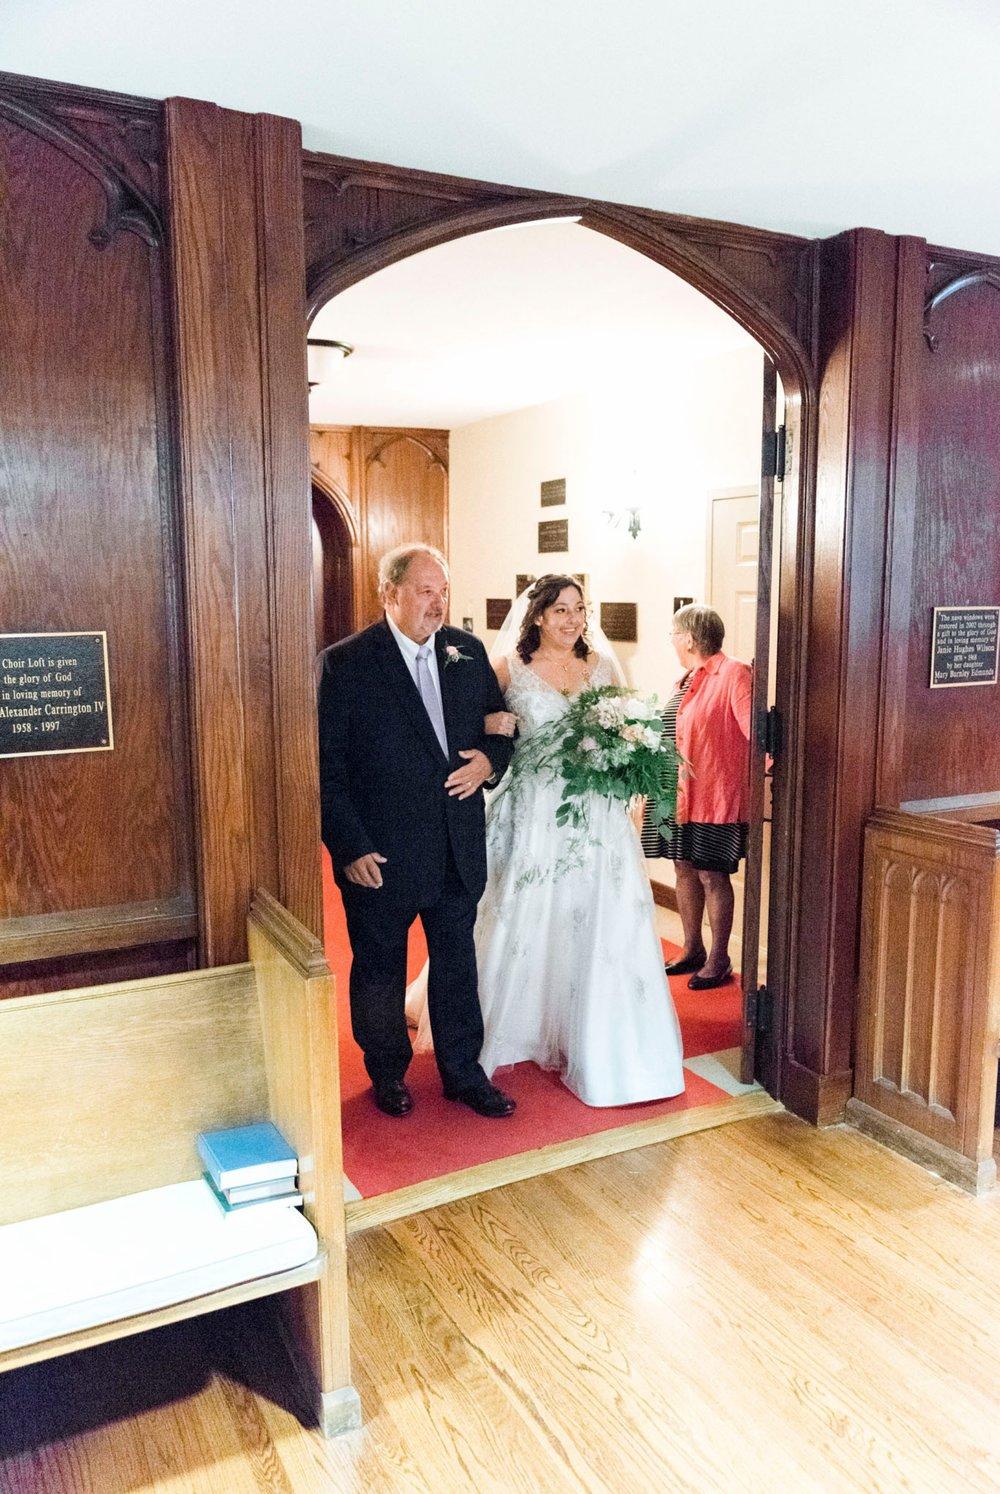 TheVirginianHotel_LynchburgVA_TheVirginianHotelWedding_Virginiaweddingphotographer_Lynchburgvawedding 28.jpg